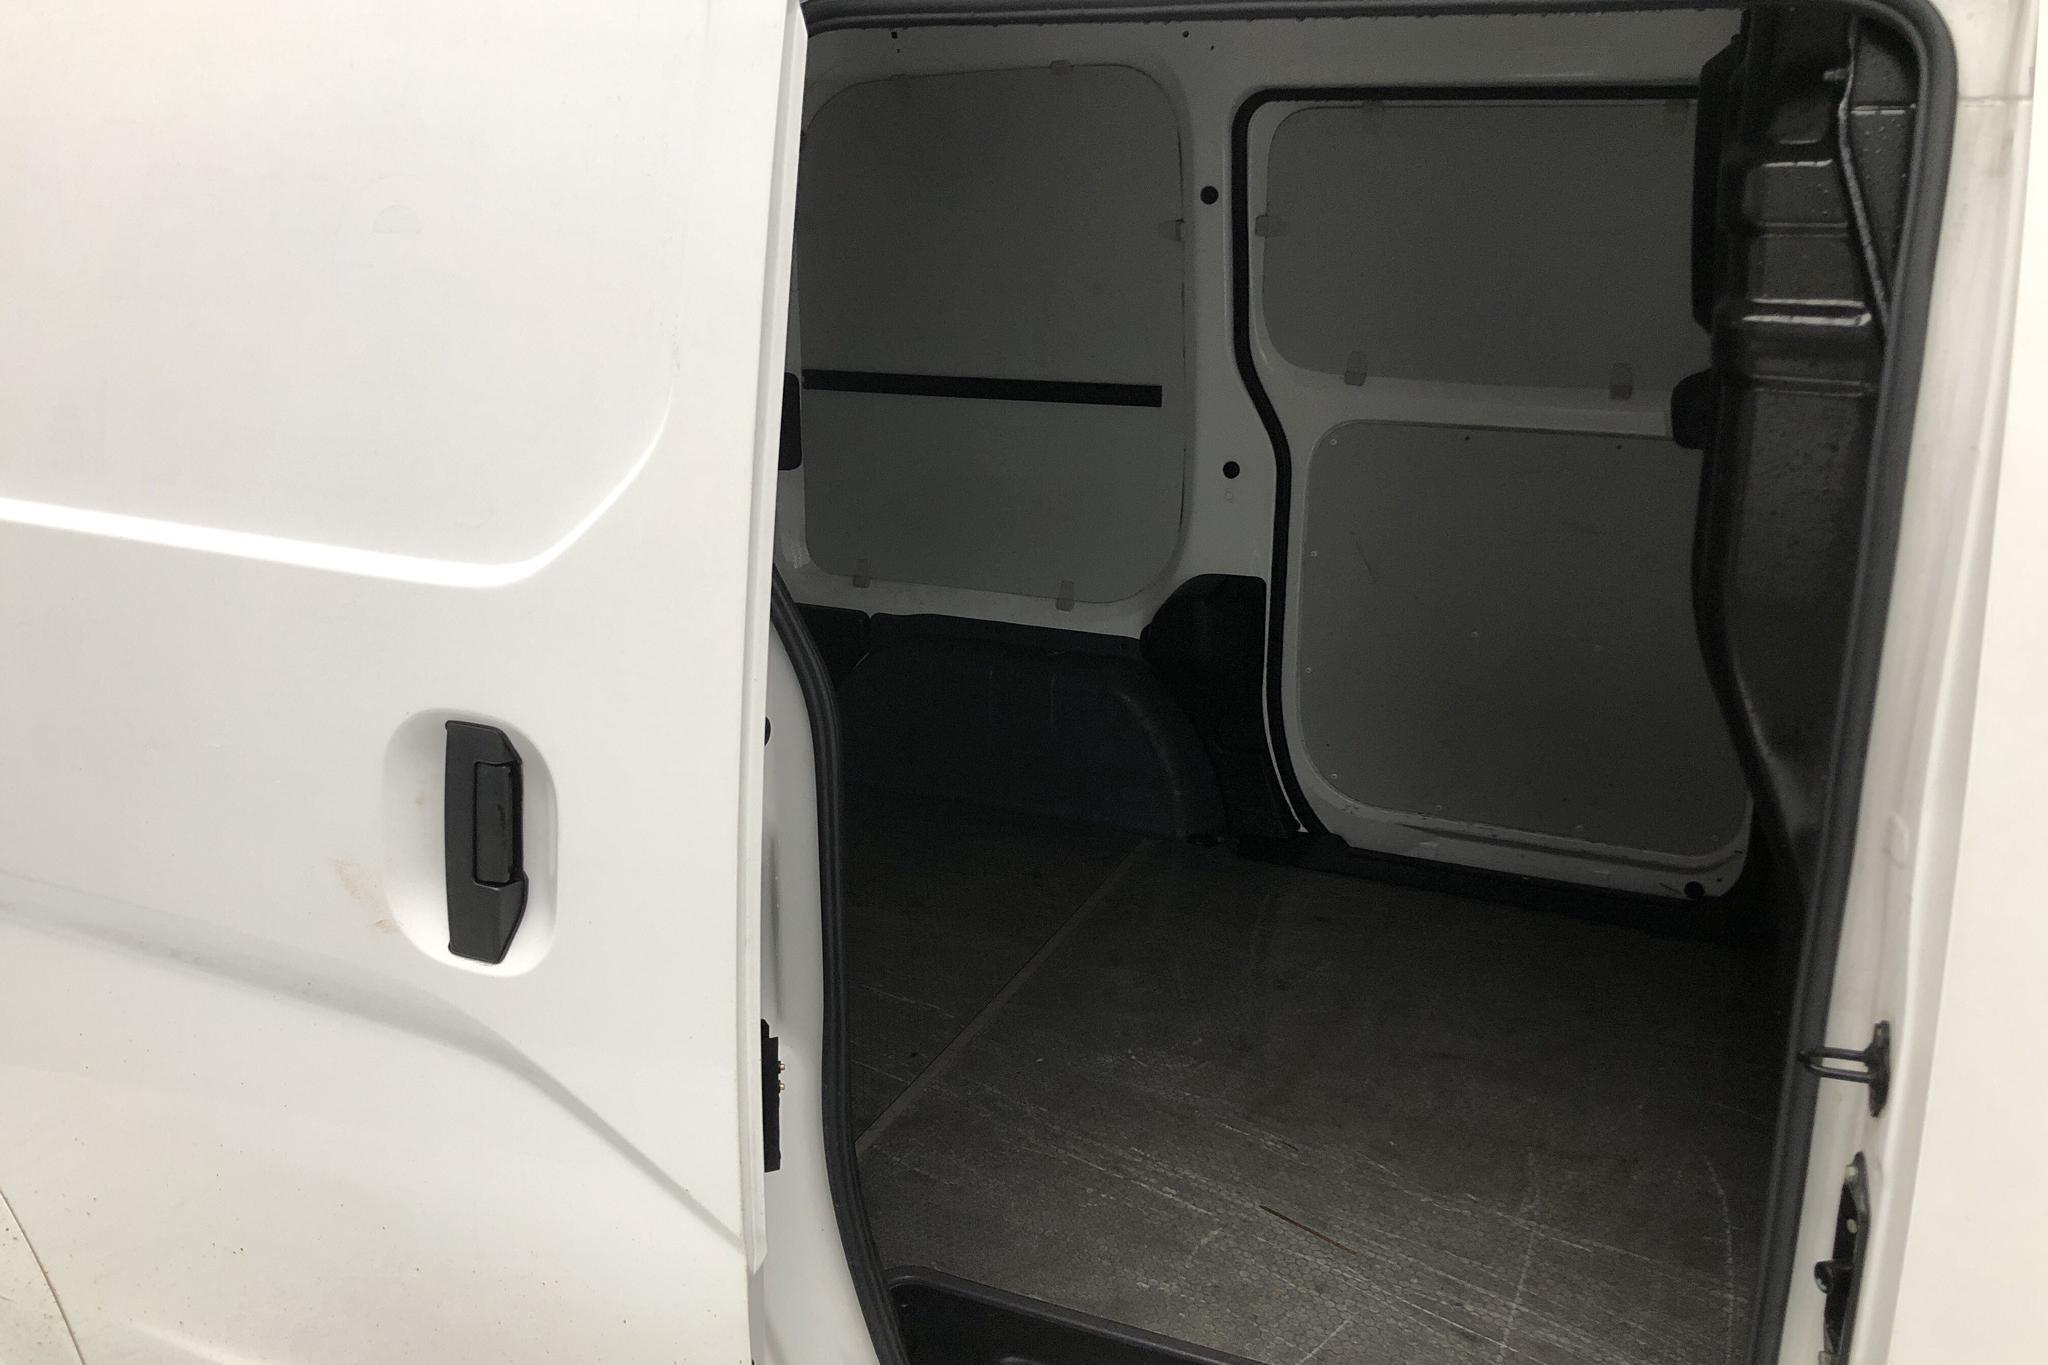 Nissan e-NV200 24,0 kWh (109hk) - 23 680 km - Automatic - white - 2015